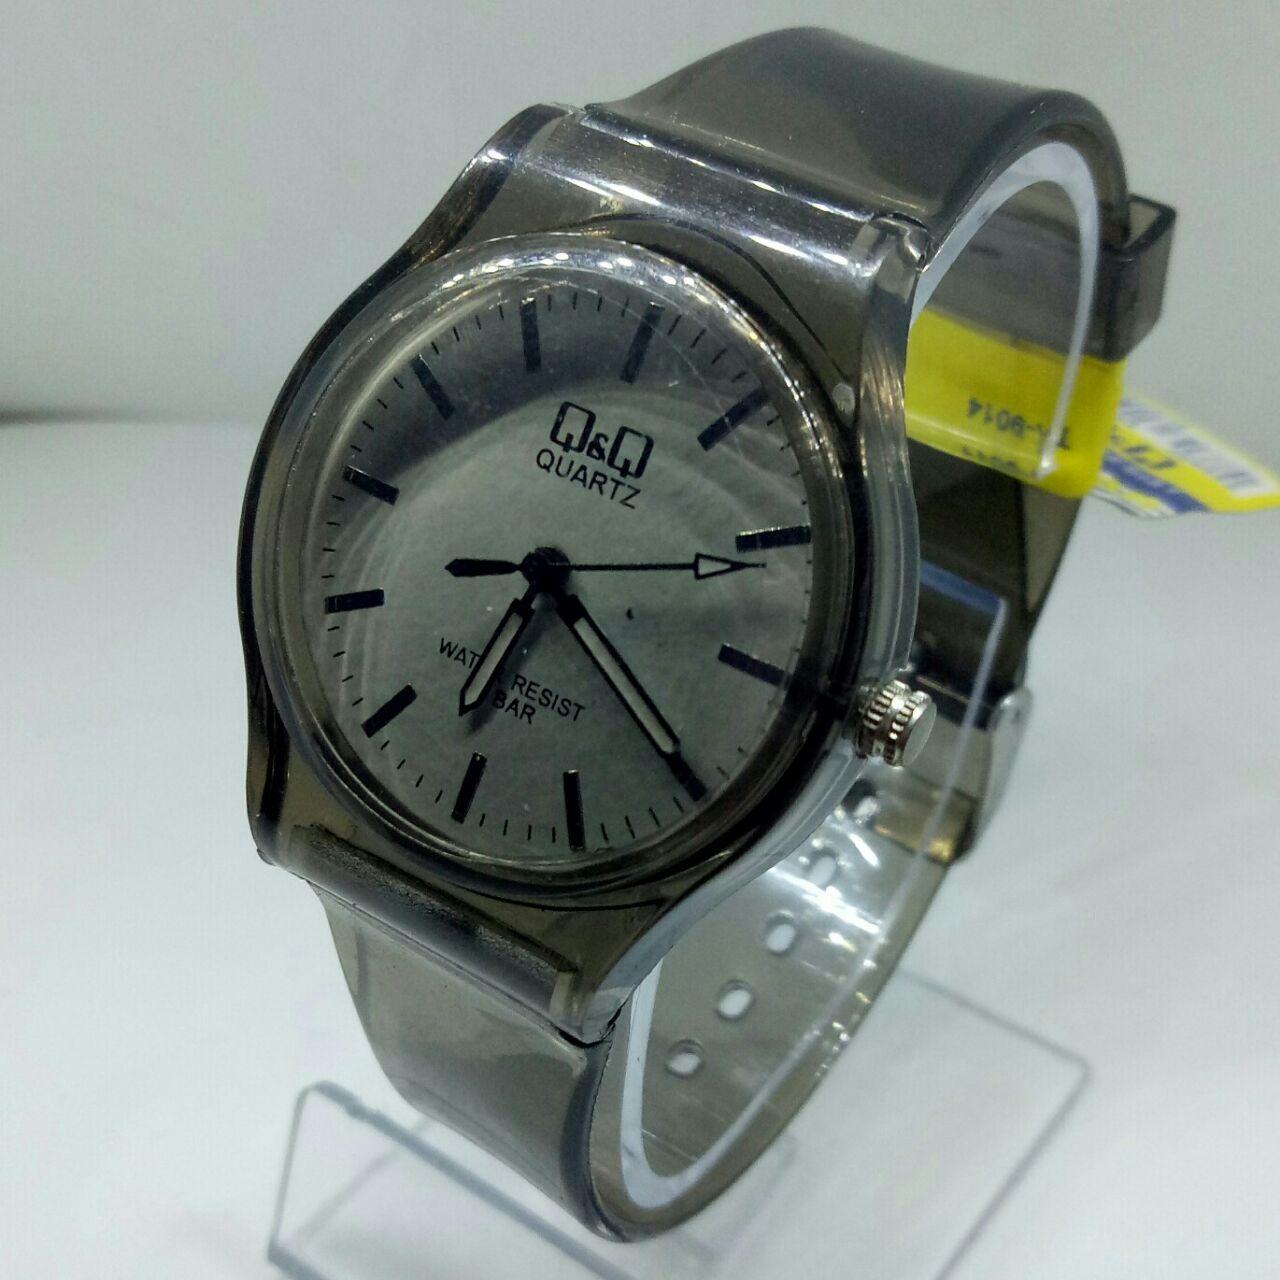 QQ original watch - jam tangan wanita casual QQ Transparan - rubber strap - water resist